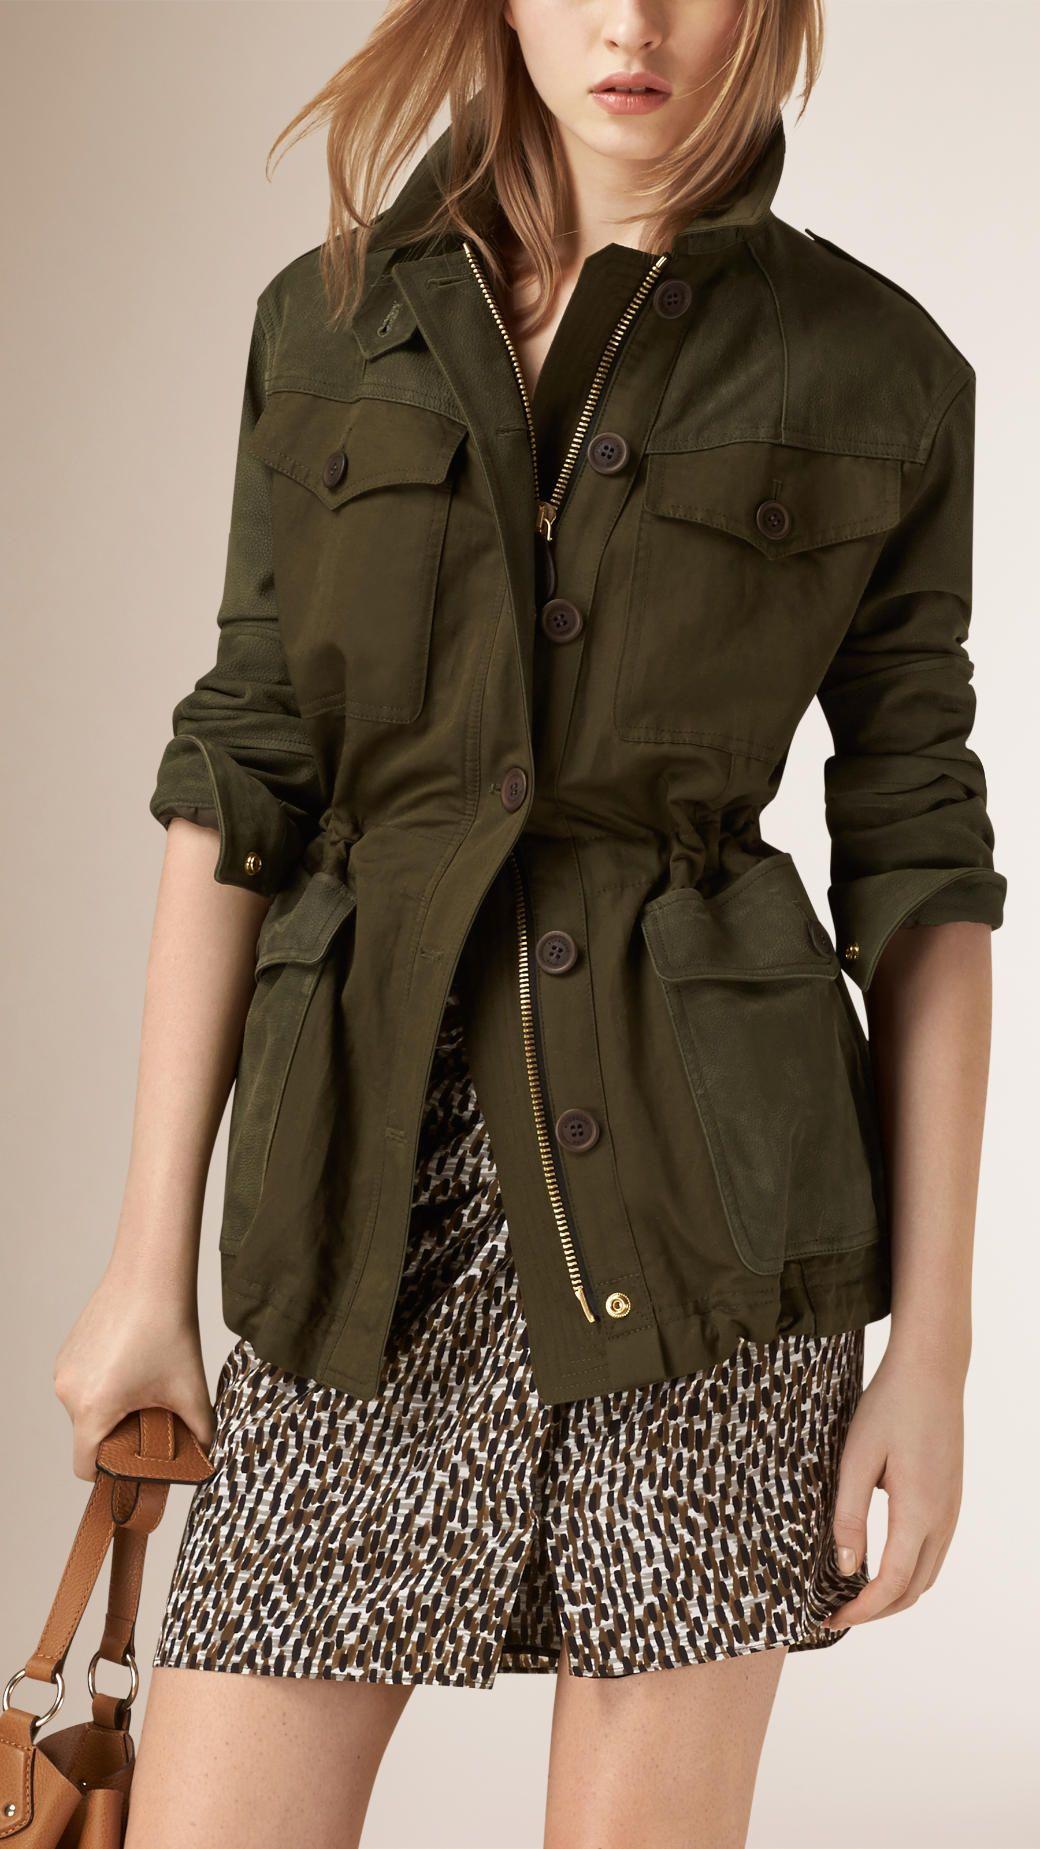 Nubuck Sleeve Cotton Linen Field Jacket Spring Outerwear Women Spring Outfits Casual Minimalist Fashion Women [ 1849 x 1040 Pixel ]